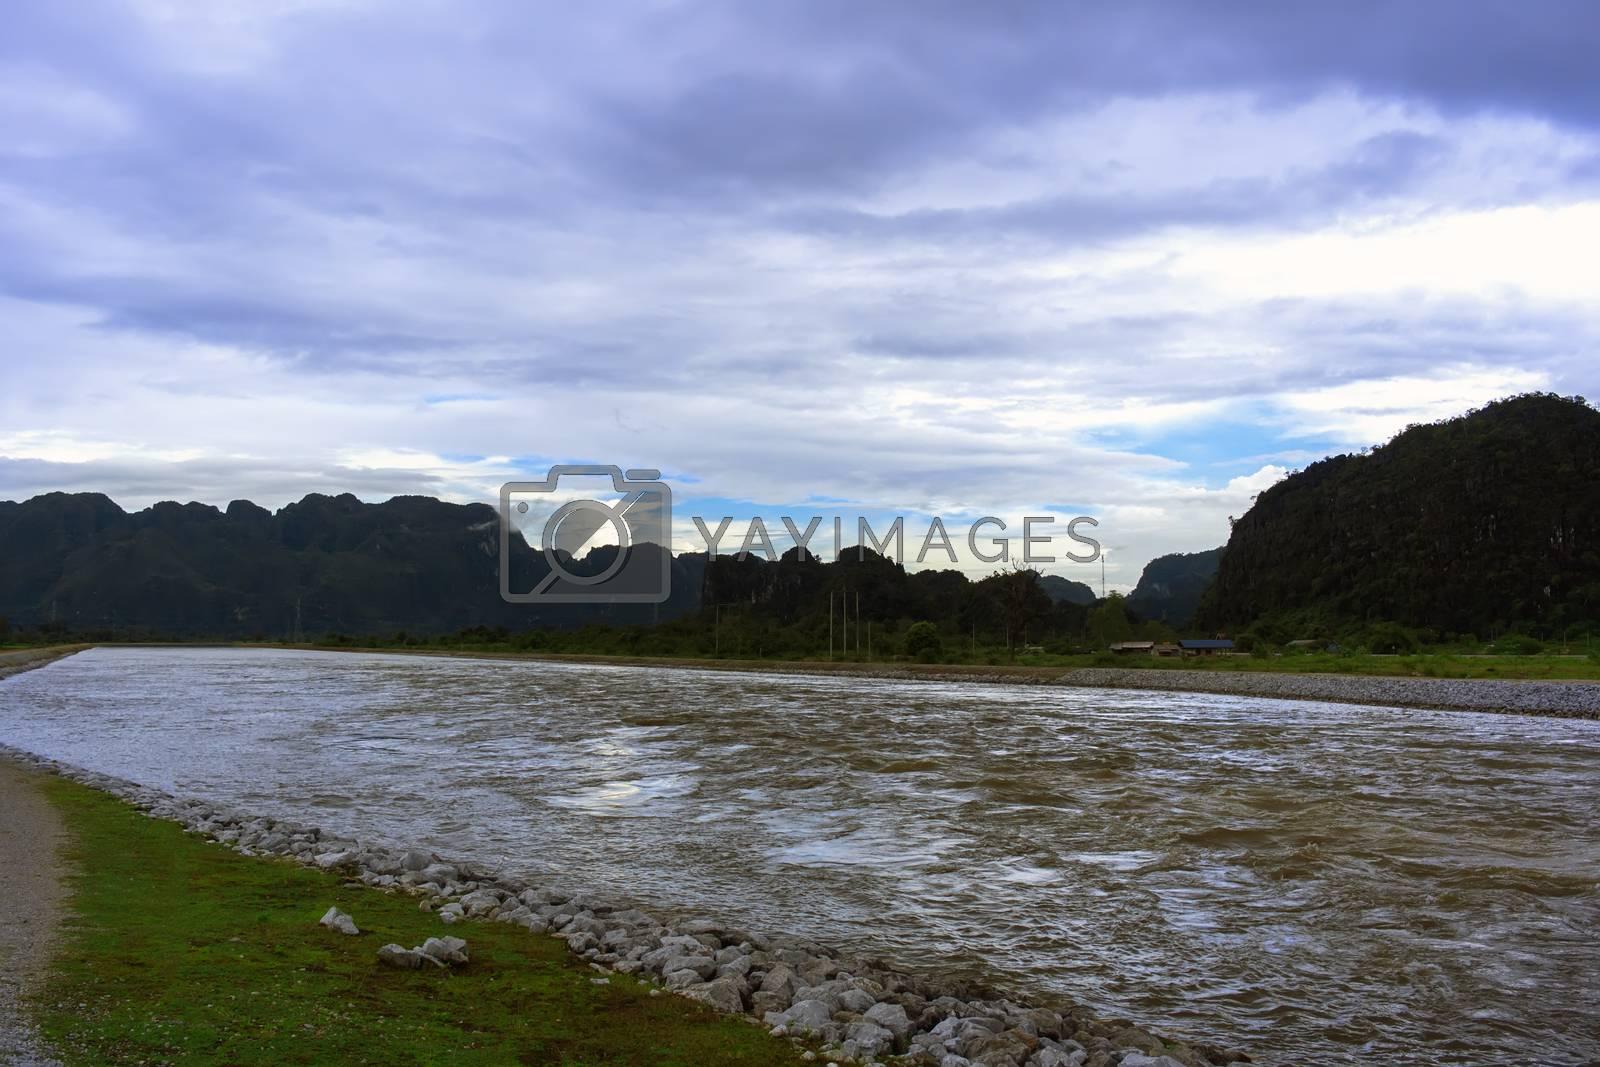 Laos Canal Landscape. by GNNick